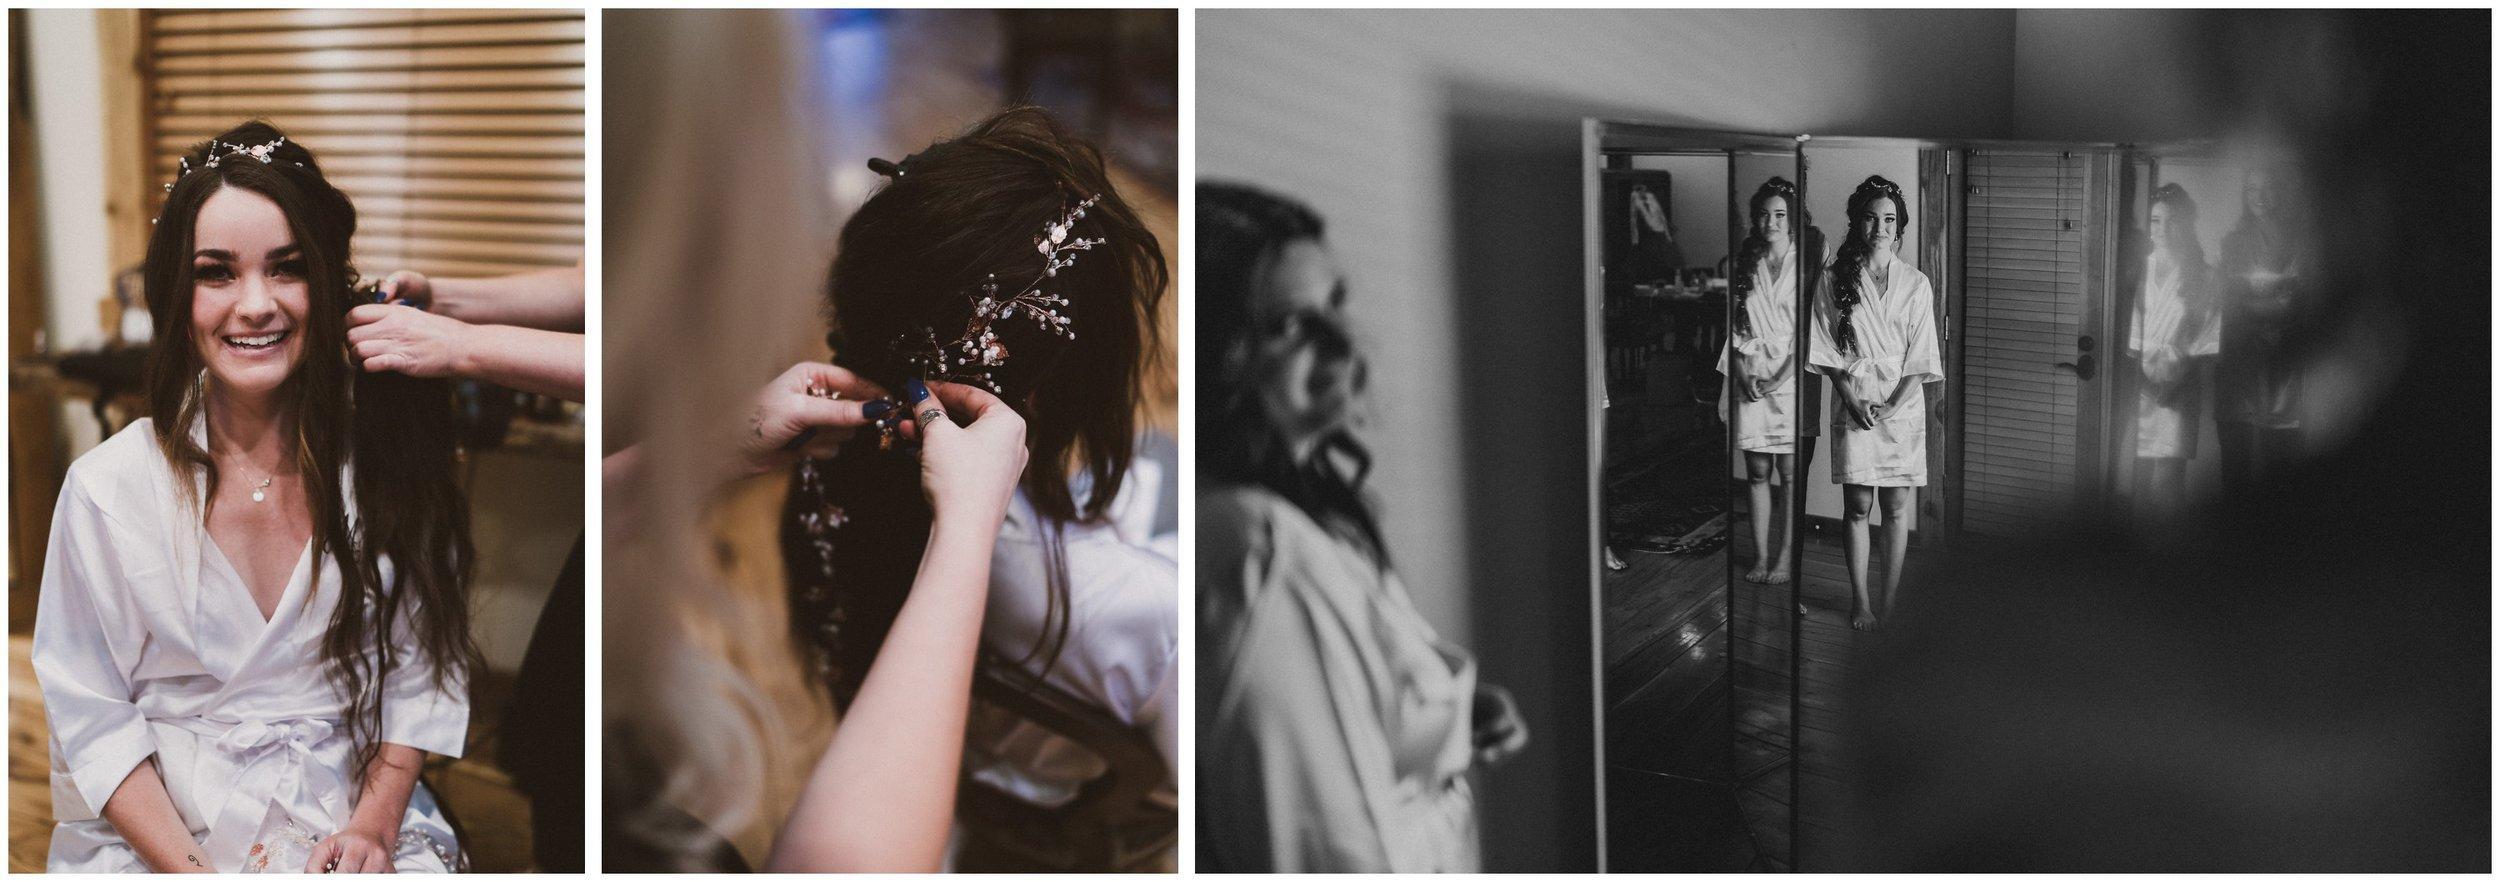 TONY-GAMBINO-PHOTOGRAPHY-BEND-OREGON-WEDDING-SHOOT-000_1502 bride hair make up.jpg